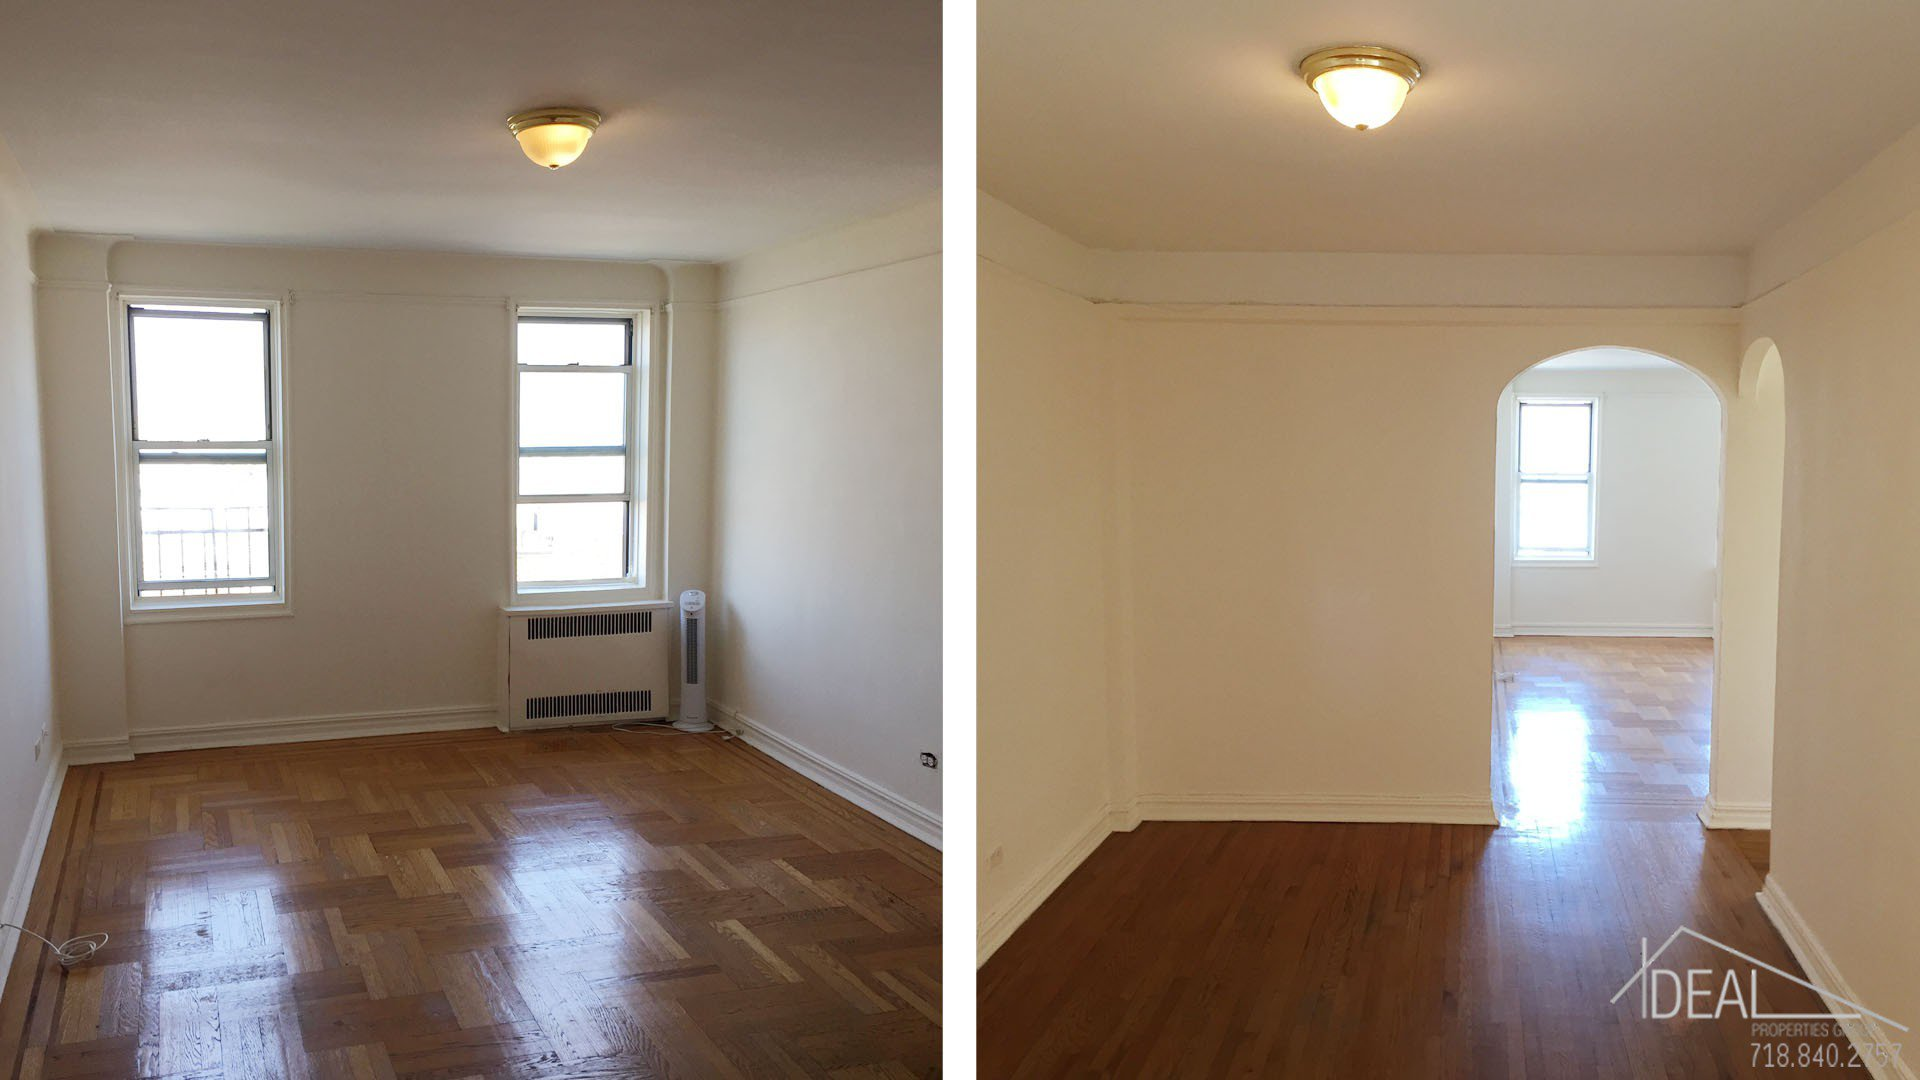 2 Bedroom Apartments For Rent In Bay Ridge Brooklyn 28